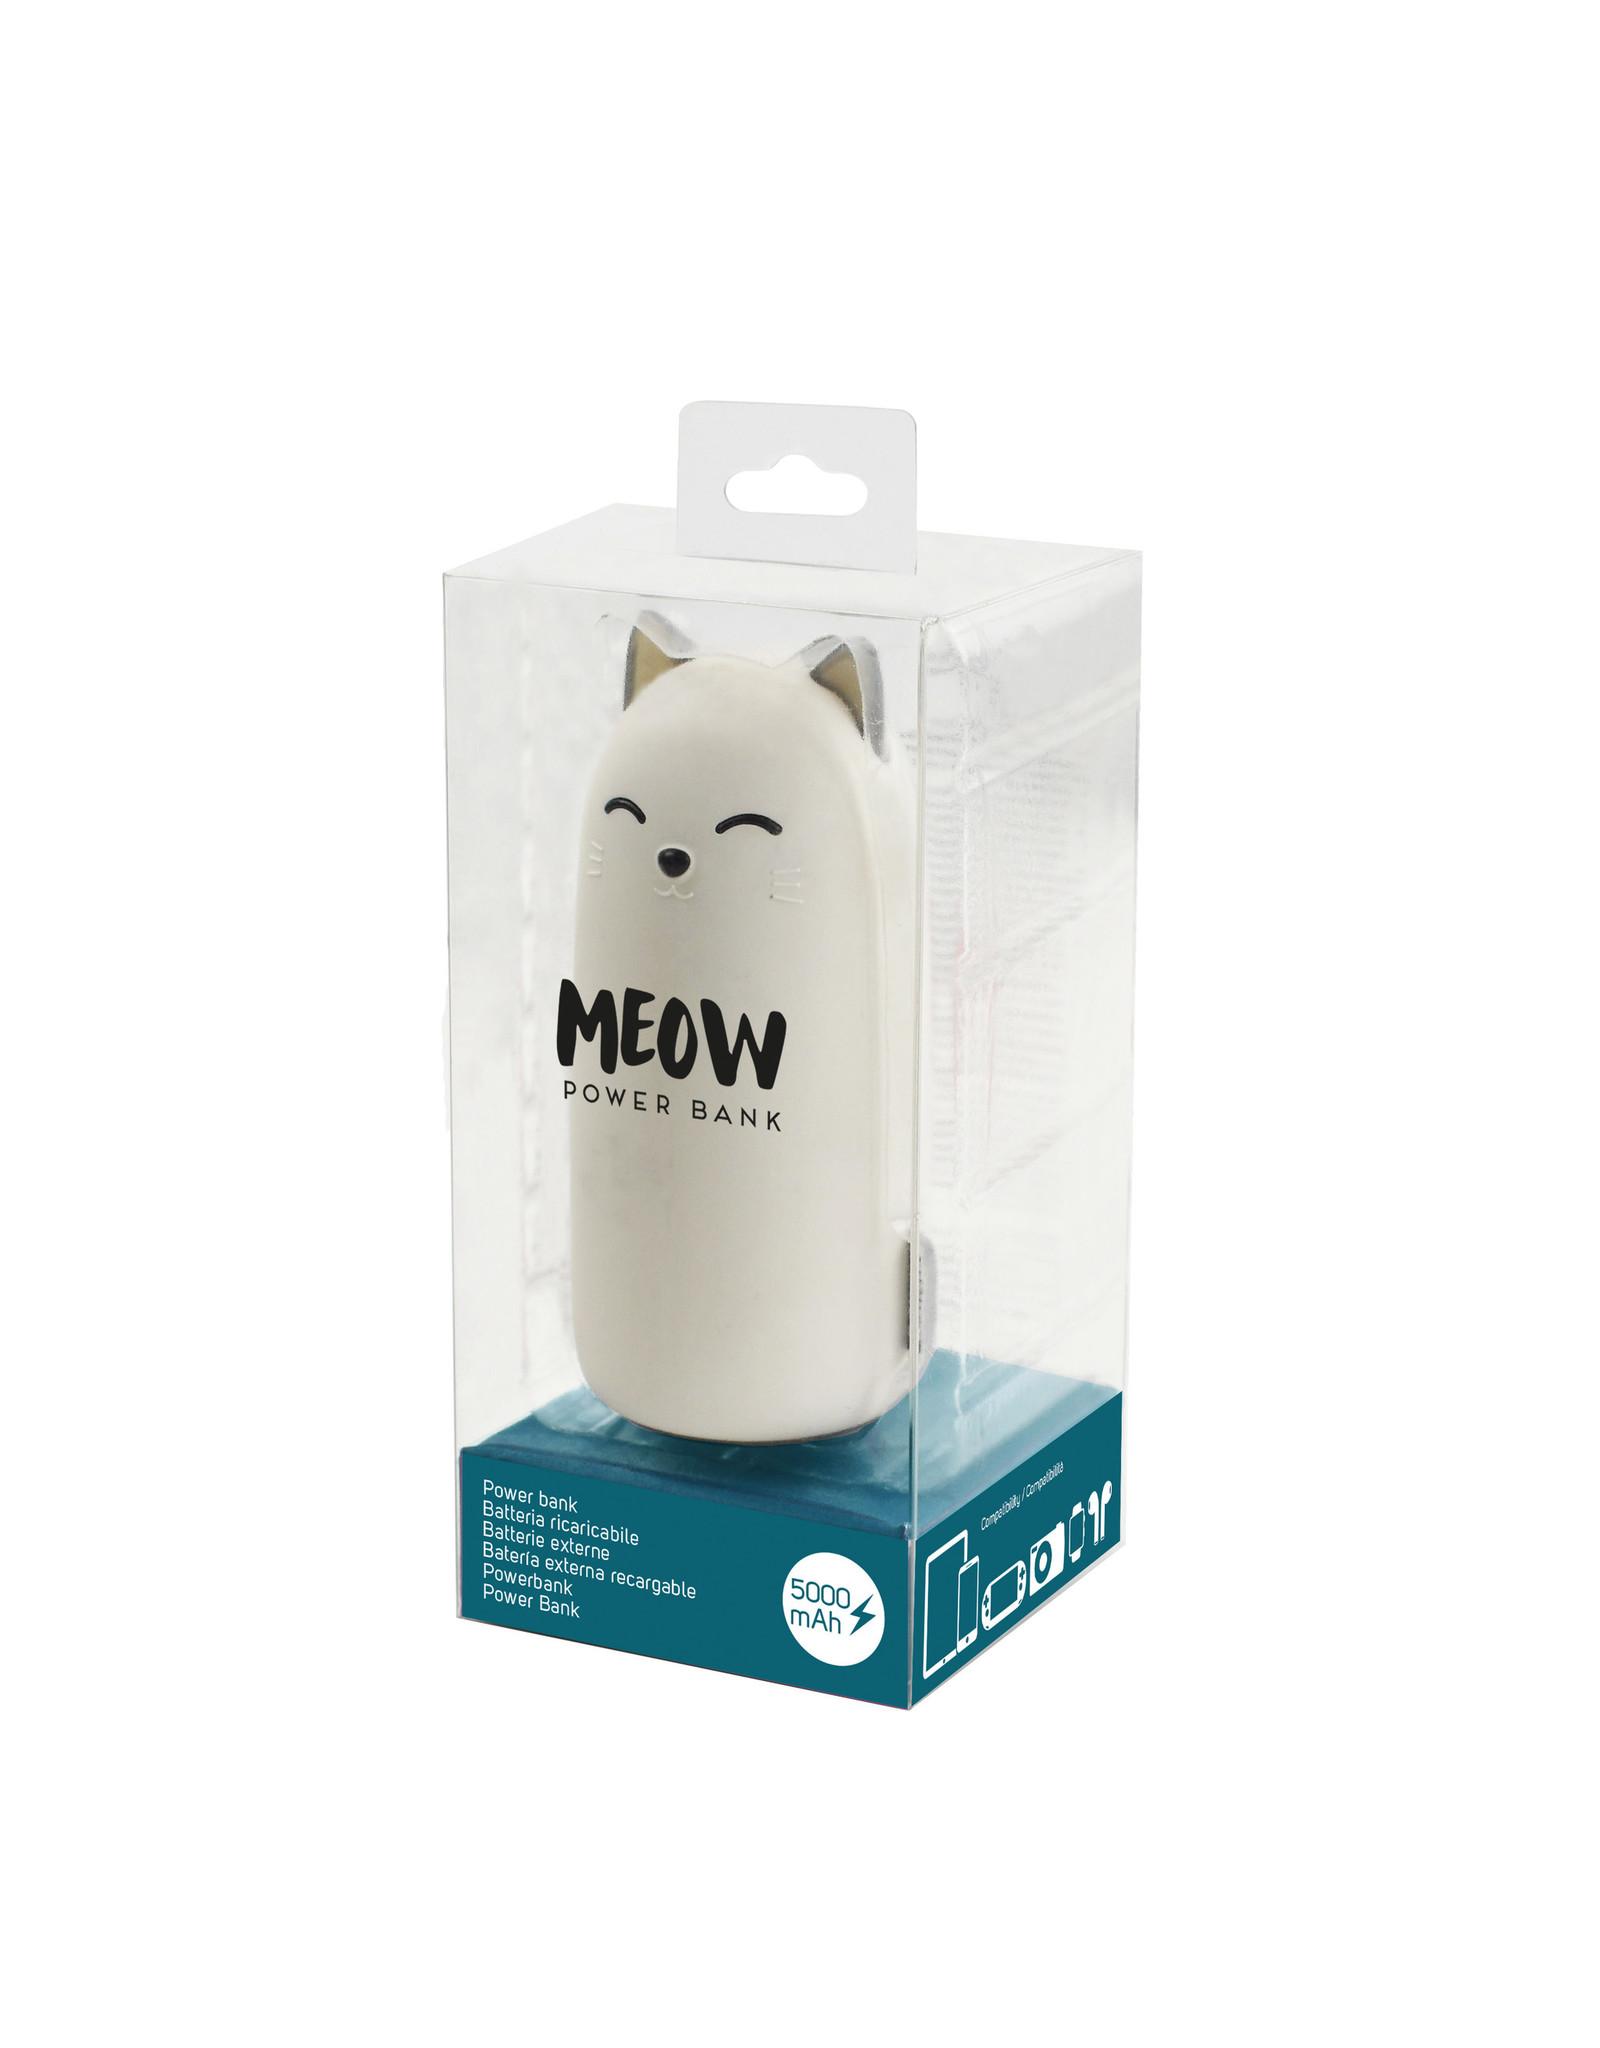 Legami power bank cat - meow